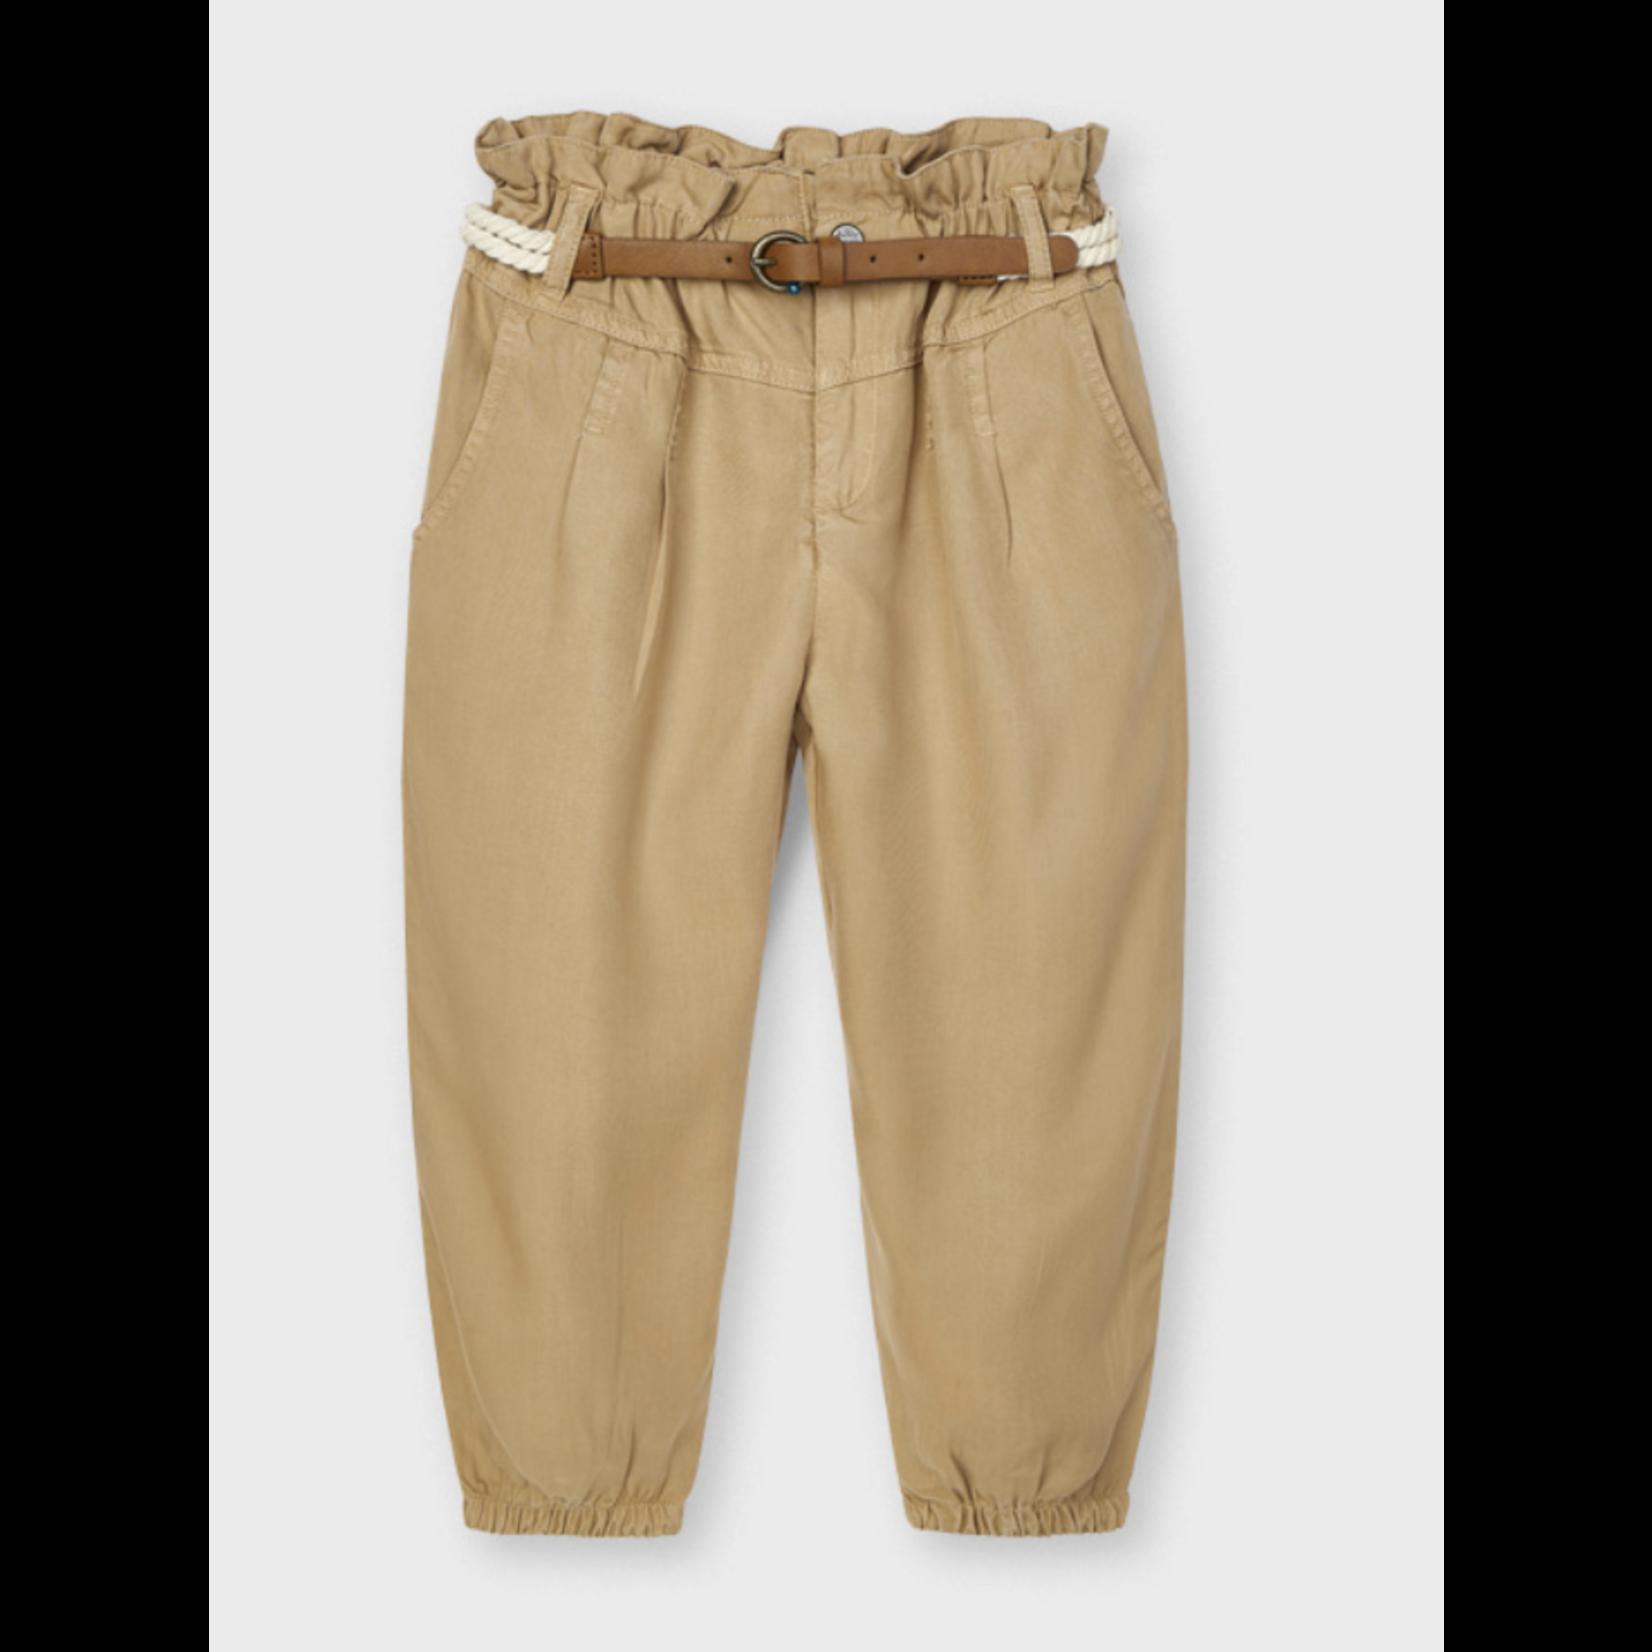 Mayoral long pant with belt Caramel